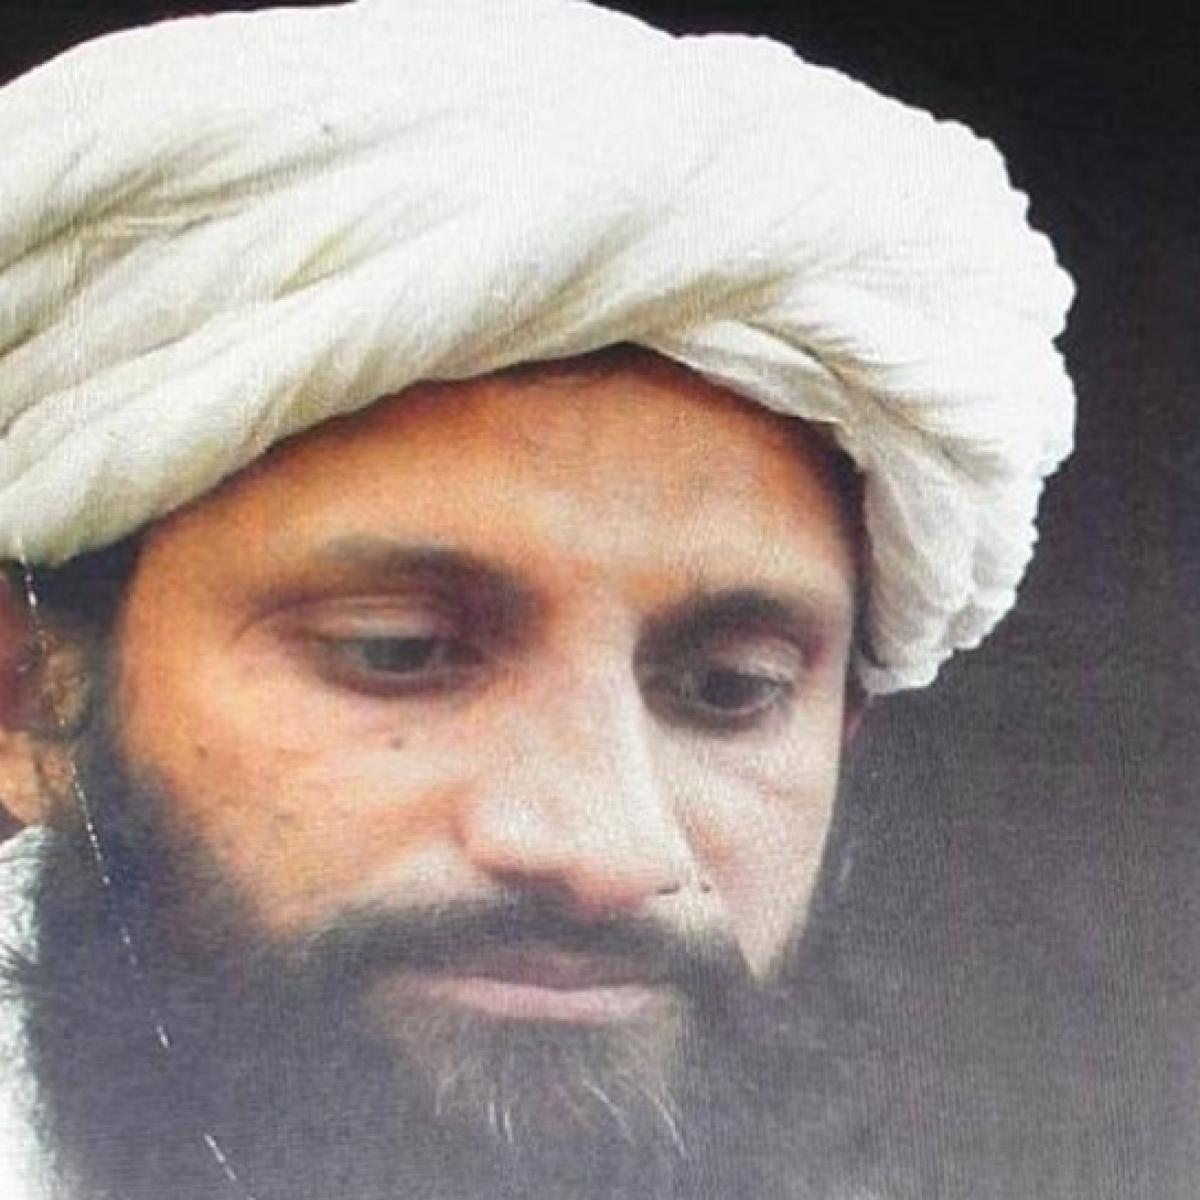 India-born Al Qaeda chief of Indian Subcontinent killed in raid